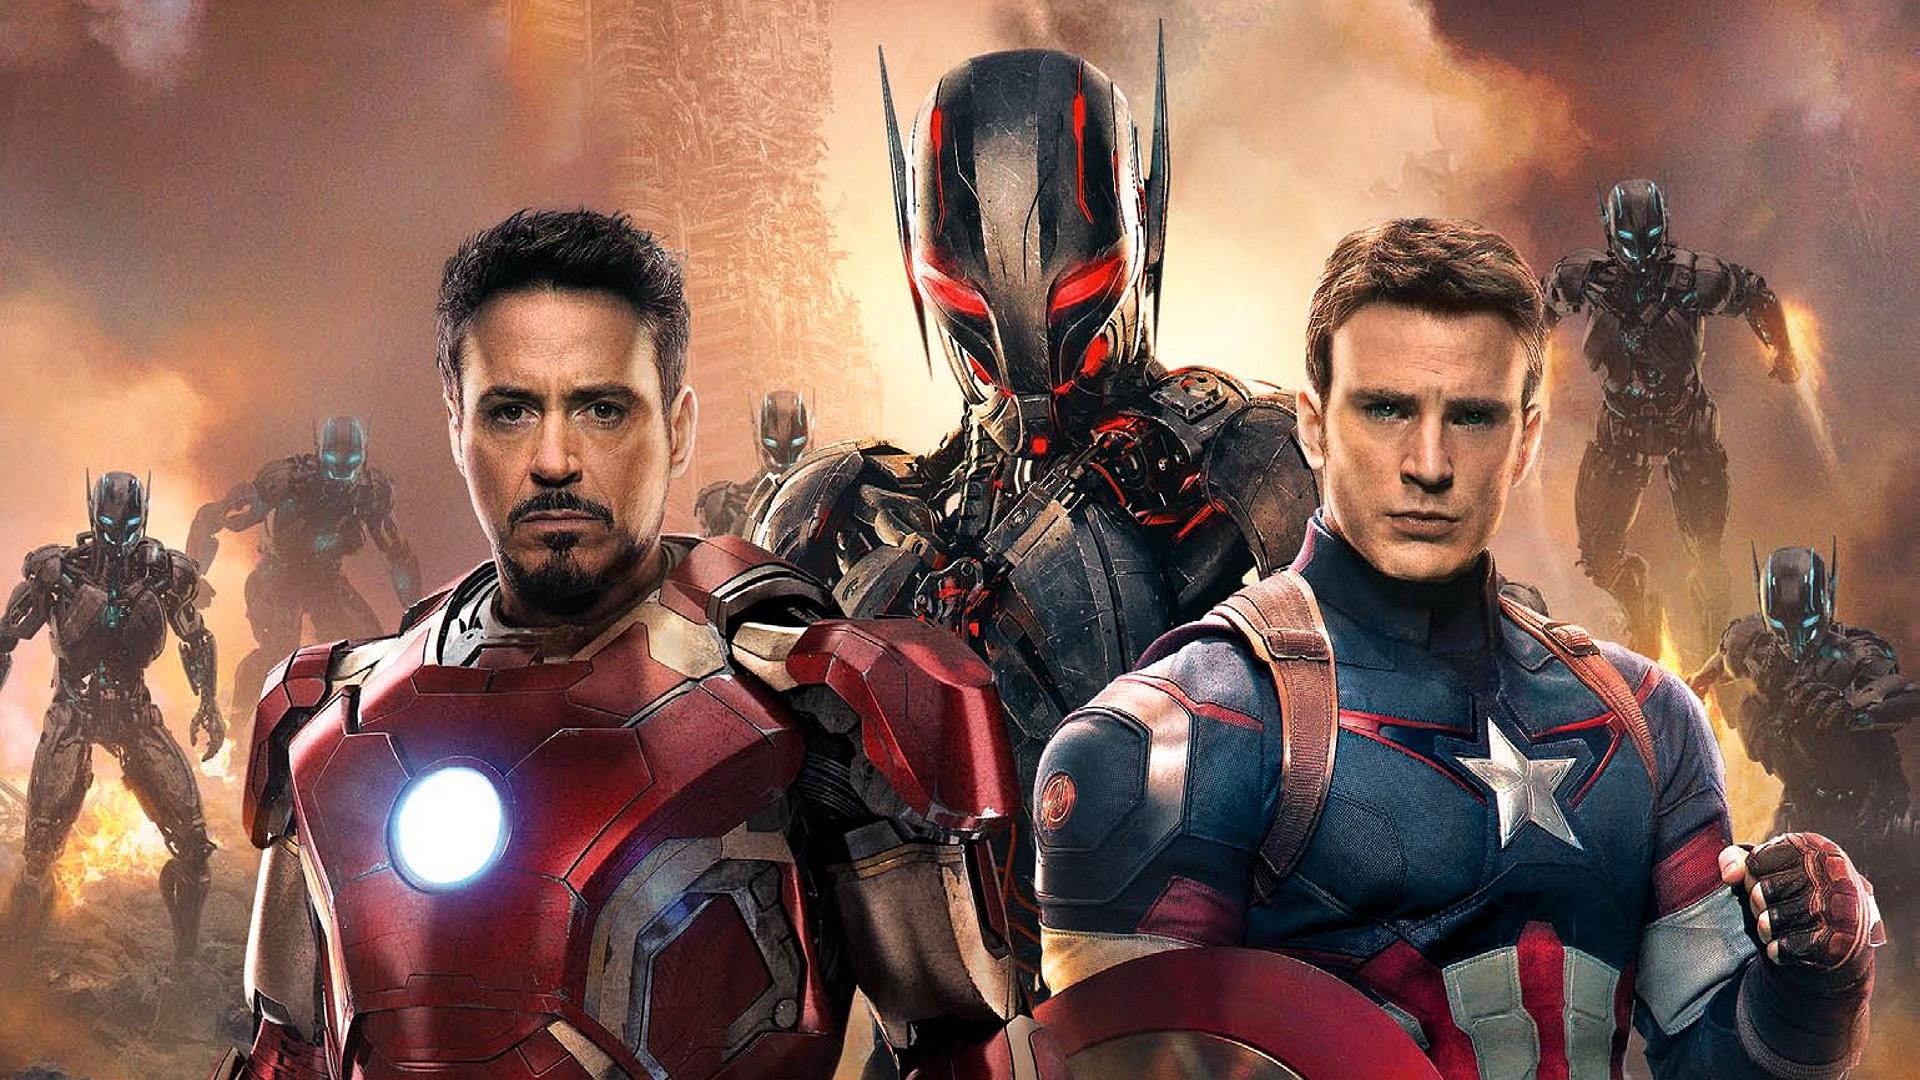 General 1920x1080 Avengers: Age of Ultron Iron Man Captain America Ultron movies Tony Stark Chris Evans Robert Downey Jr. Steve Rogers